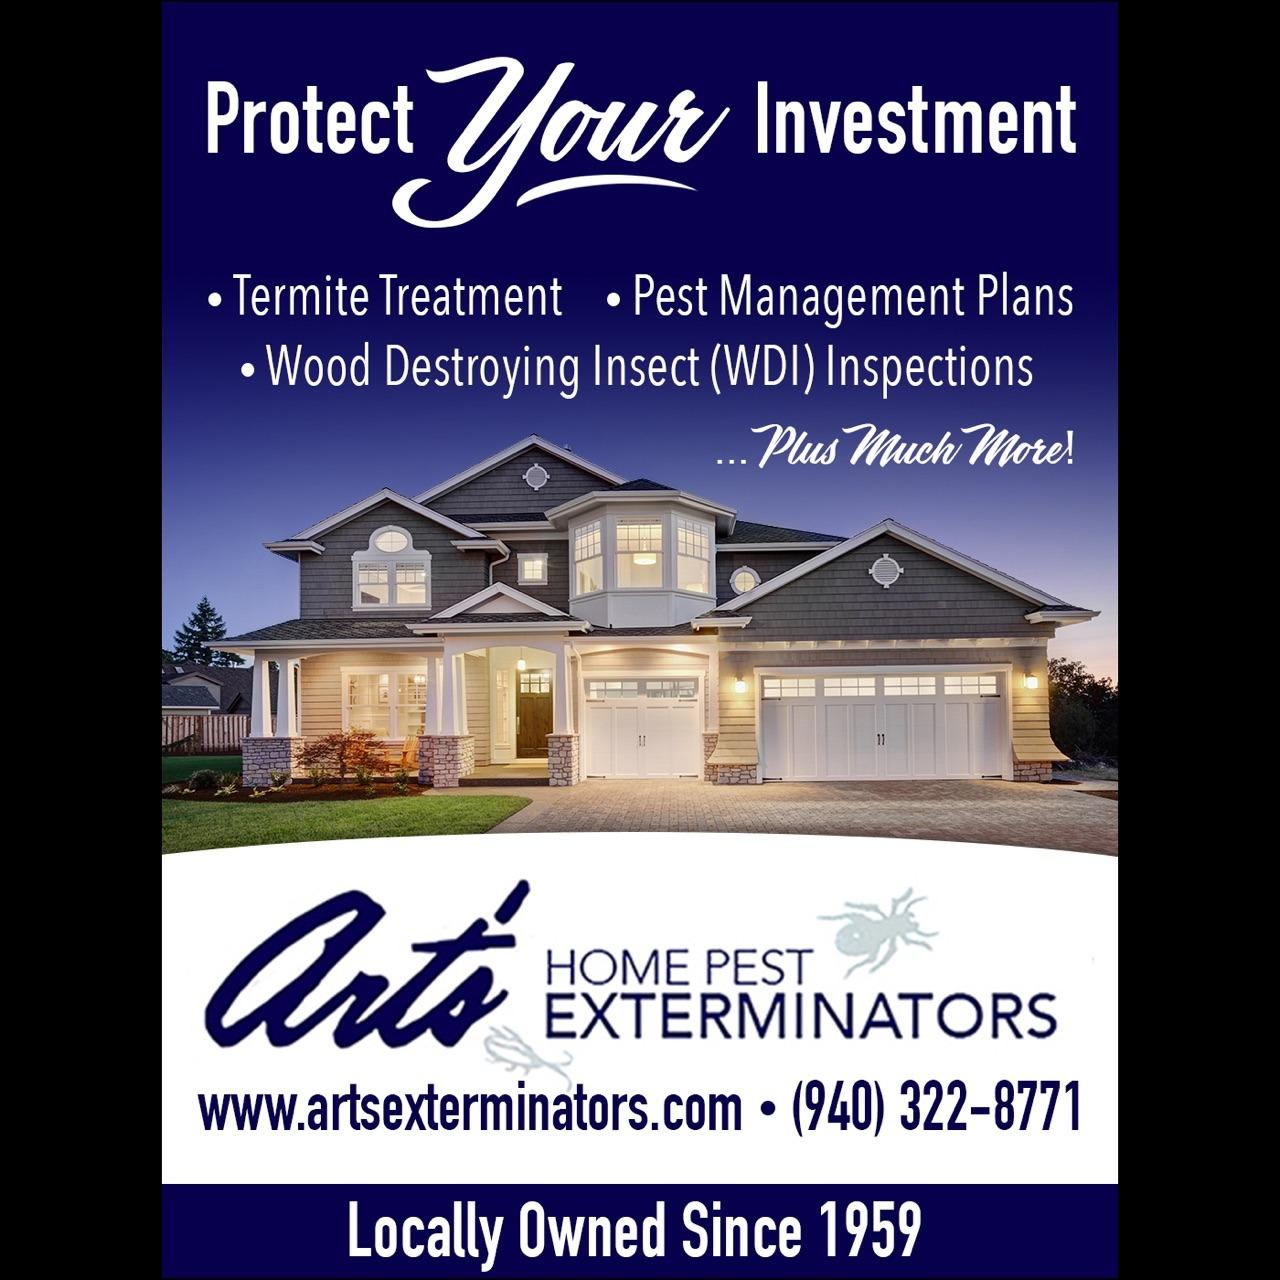 Art 39 s home pest exterminators wichita falls tx 76302 for Local craft fairs near me